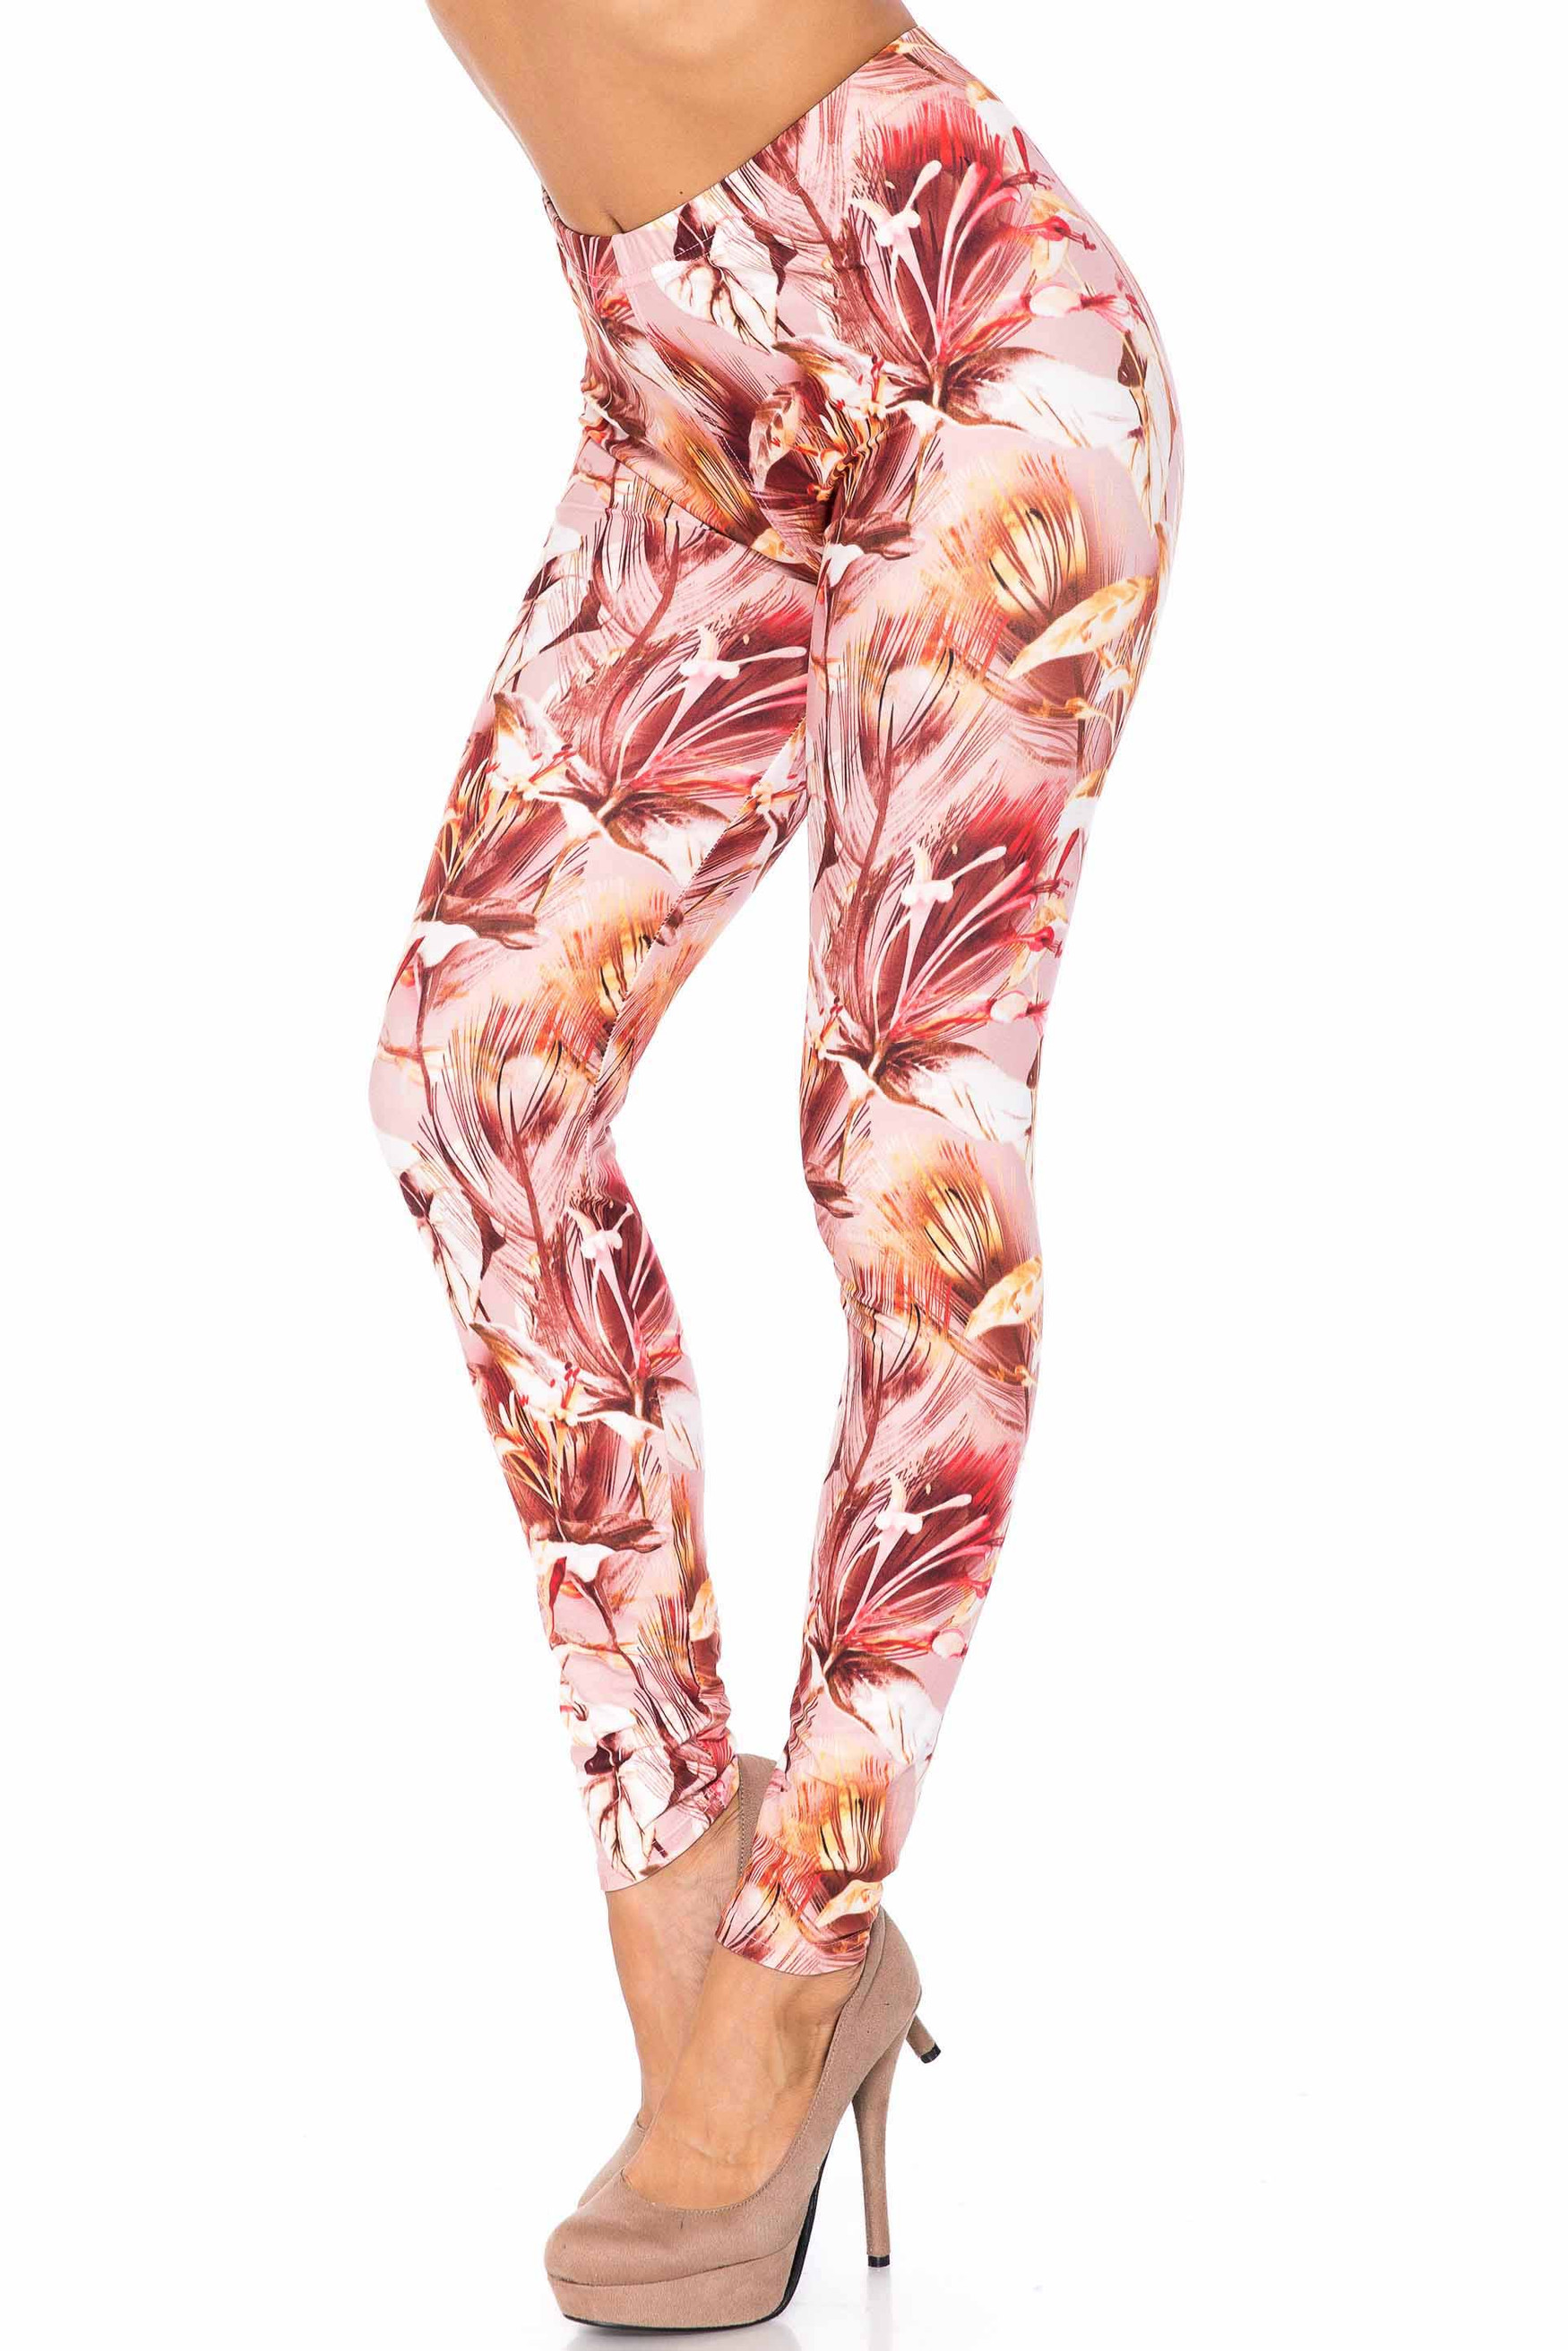 Creamy Soft Mocha Floral Extra Plus Size Leggings - 3X-5X - USA Fashion™